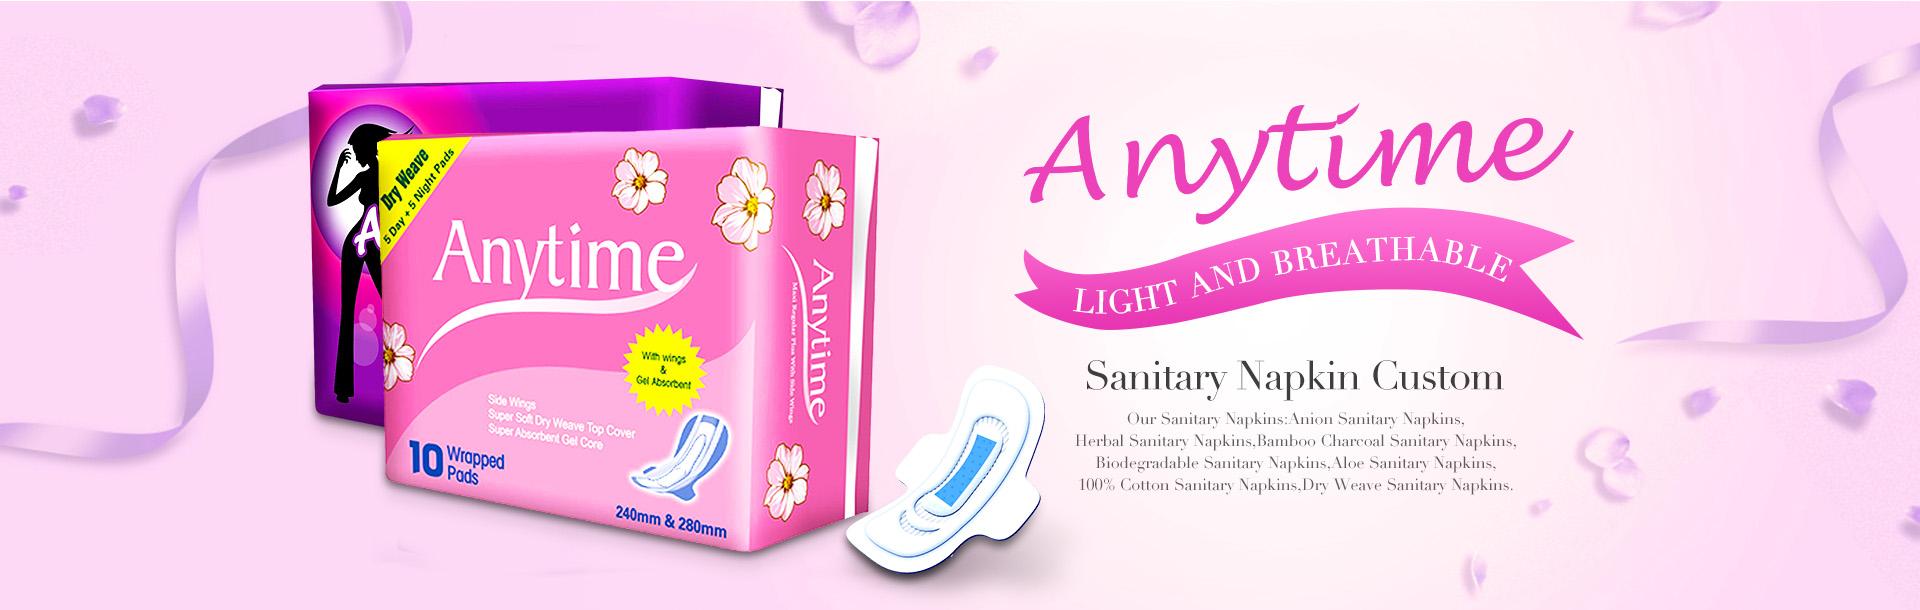 Anytime Sanitary Pad